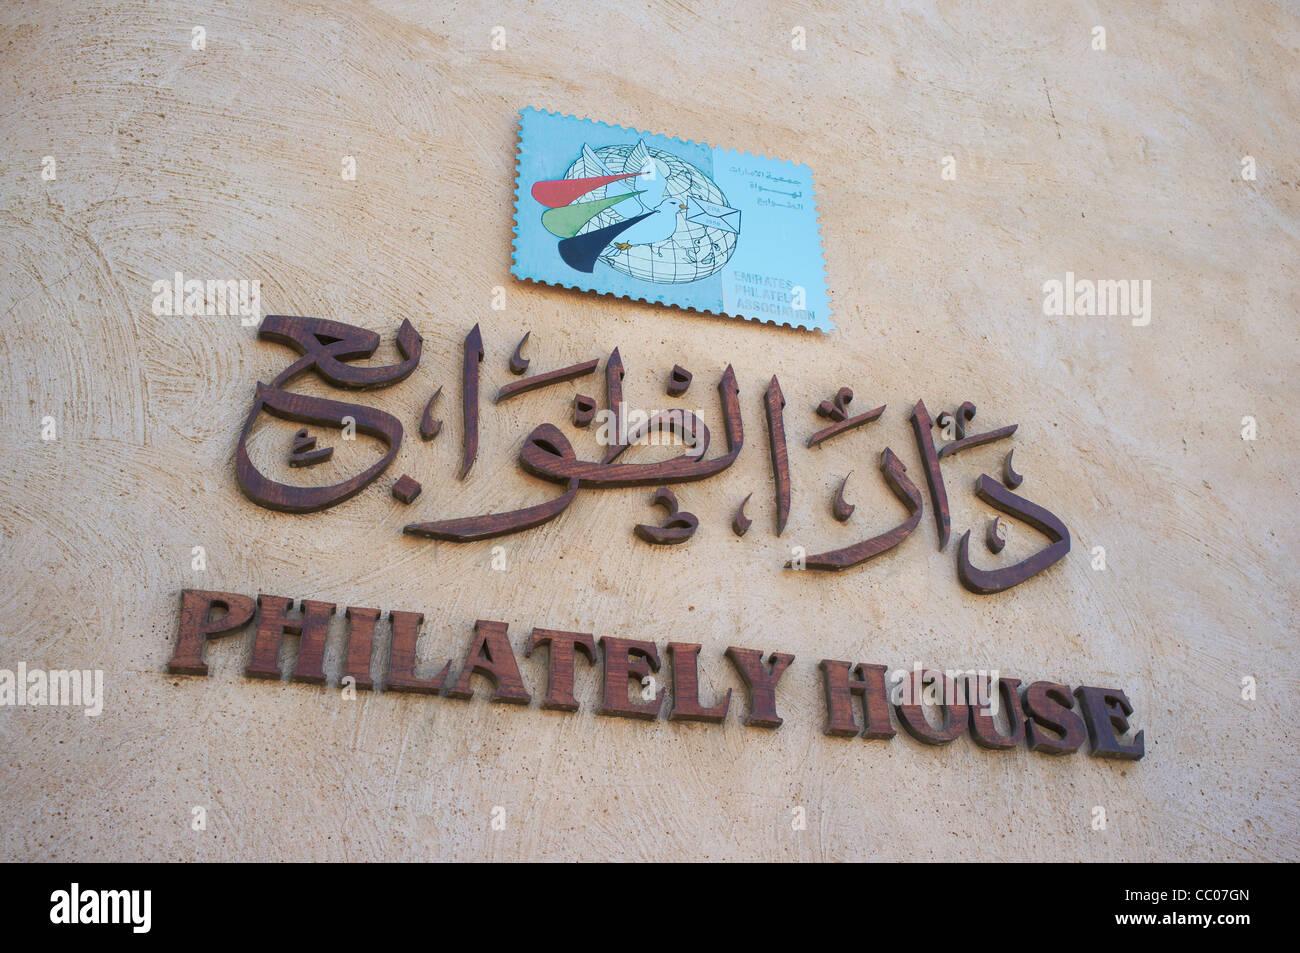 Philately House in the Bastakiya quarter of Bur Dubai district of Dubai UAE - Stock Image